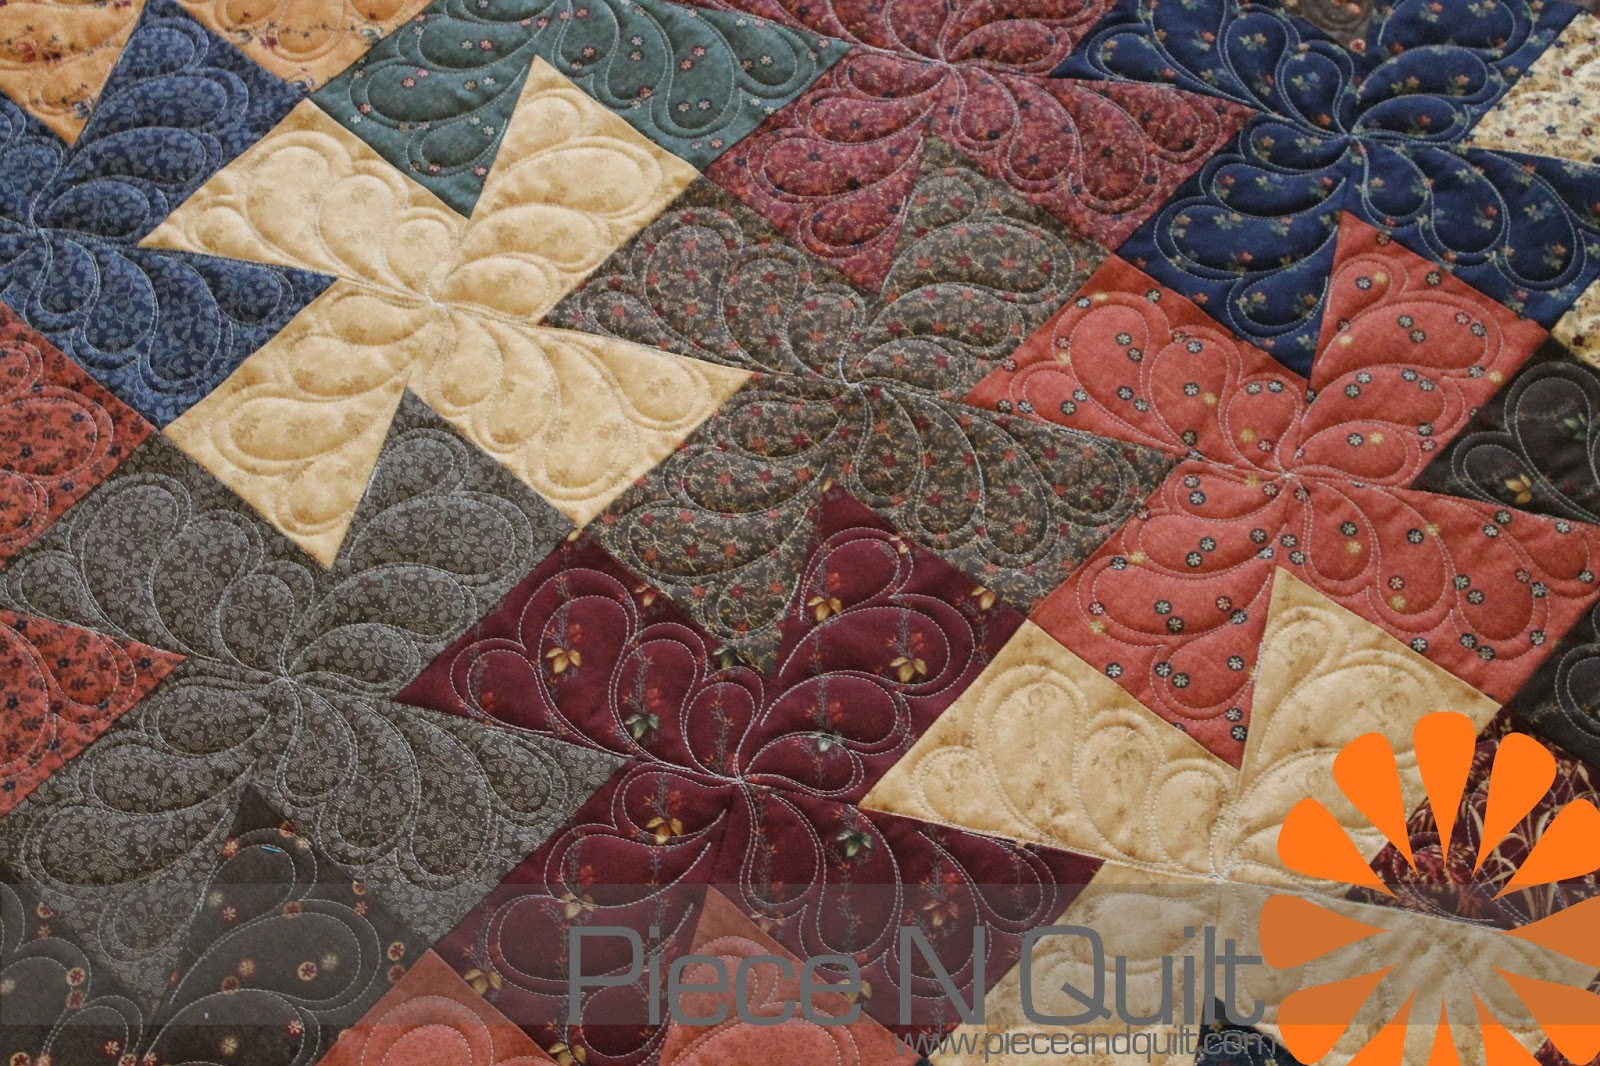 Piece N Quilt: Twister Quilt : twister quilts - Adamdwight.com